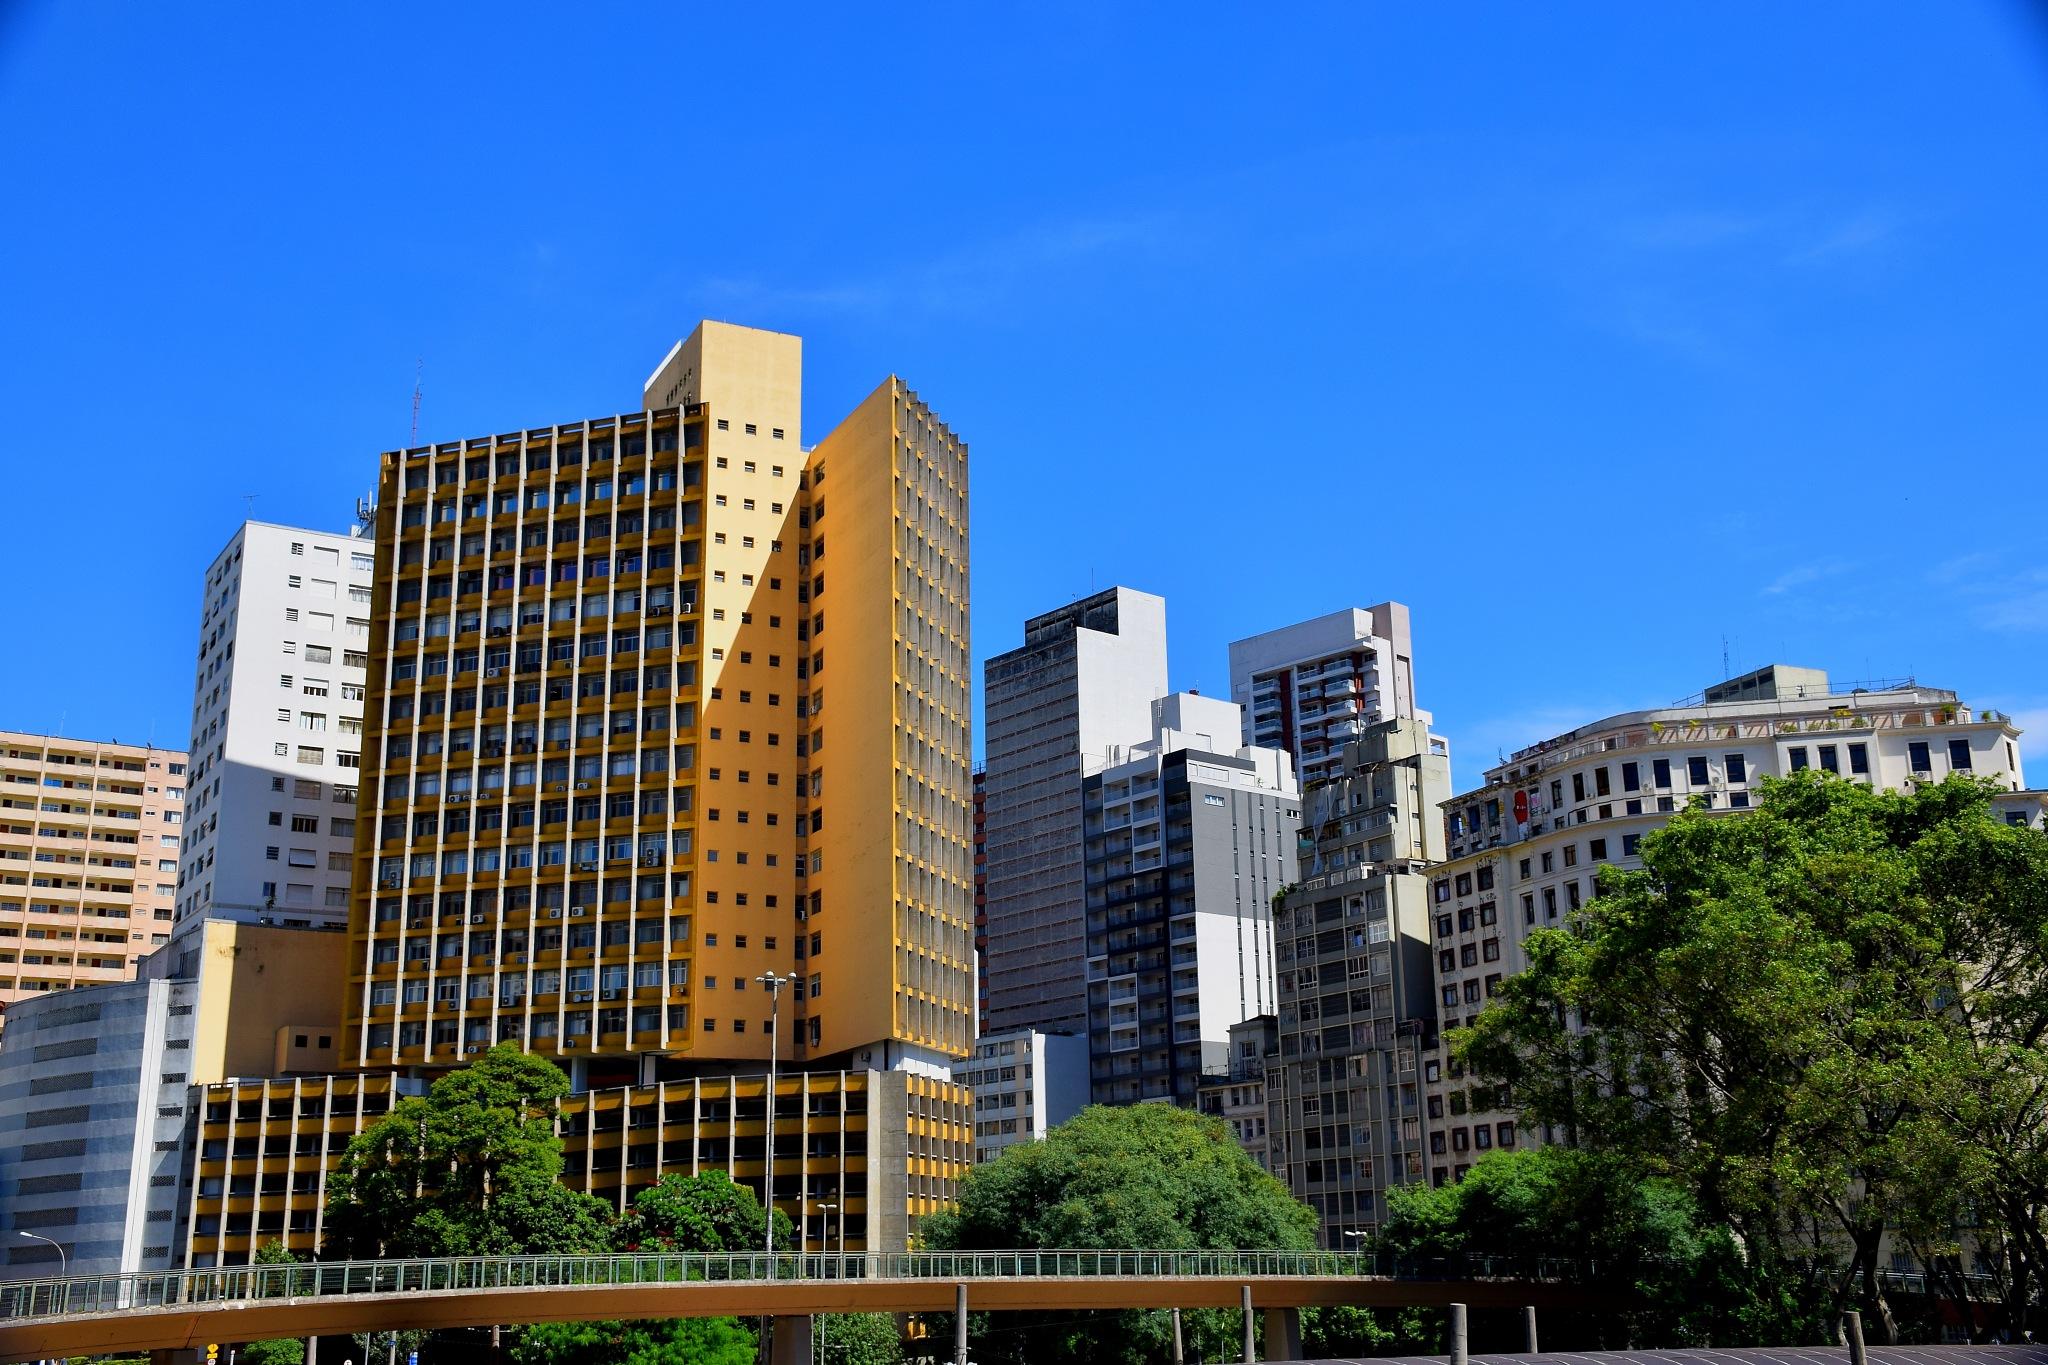 Edifício Joelma by LuixCelso